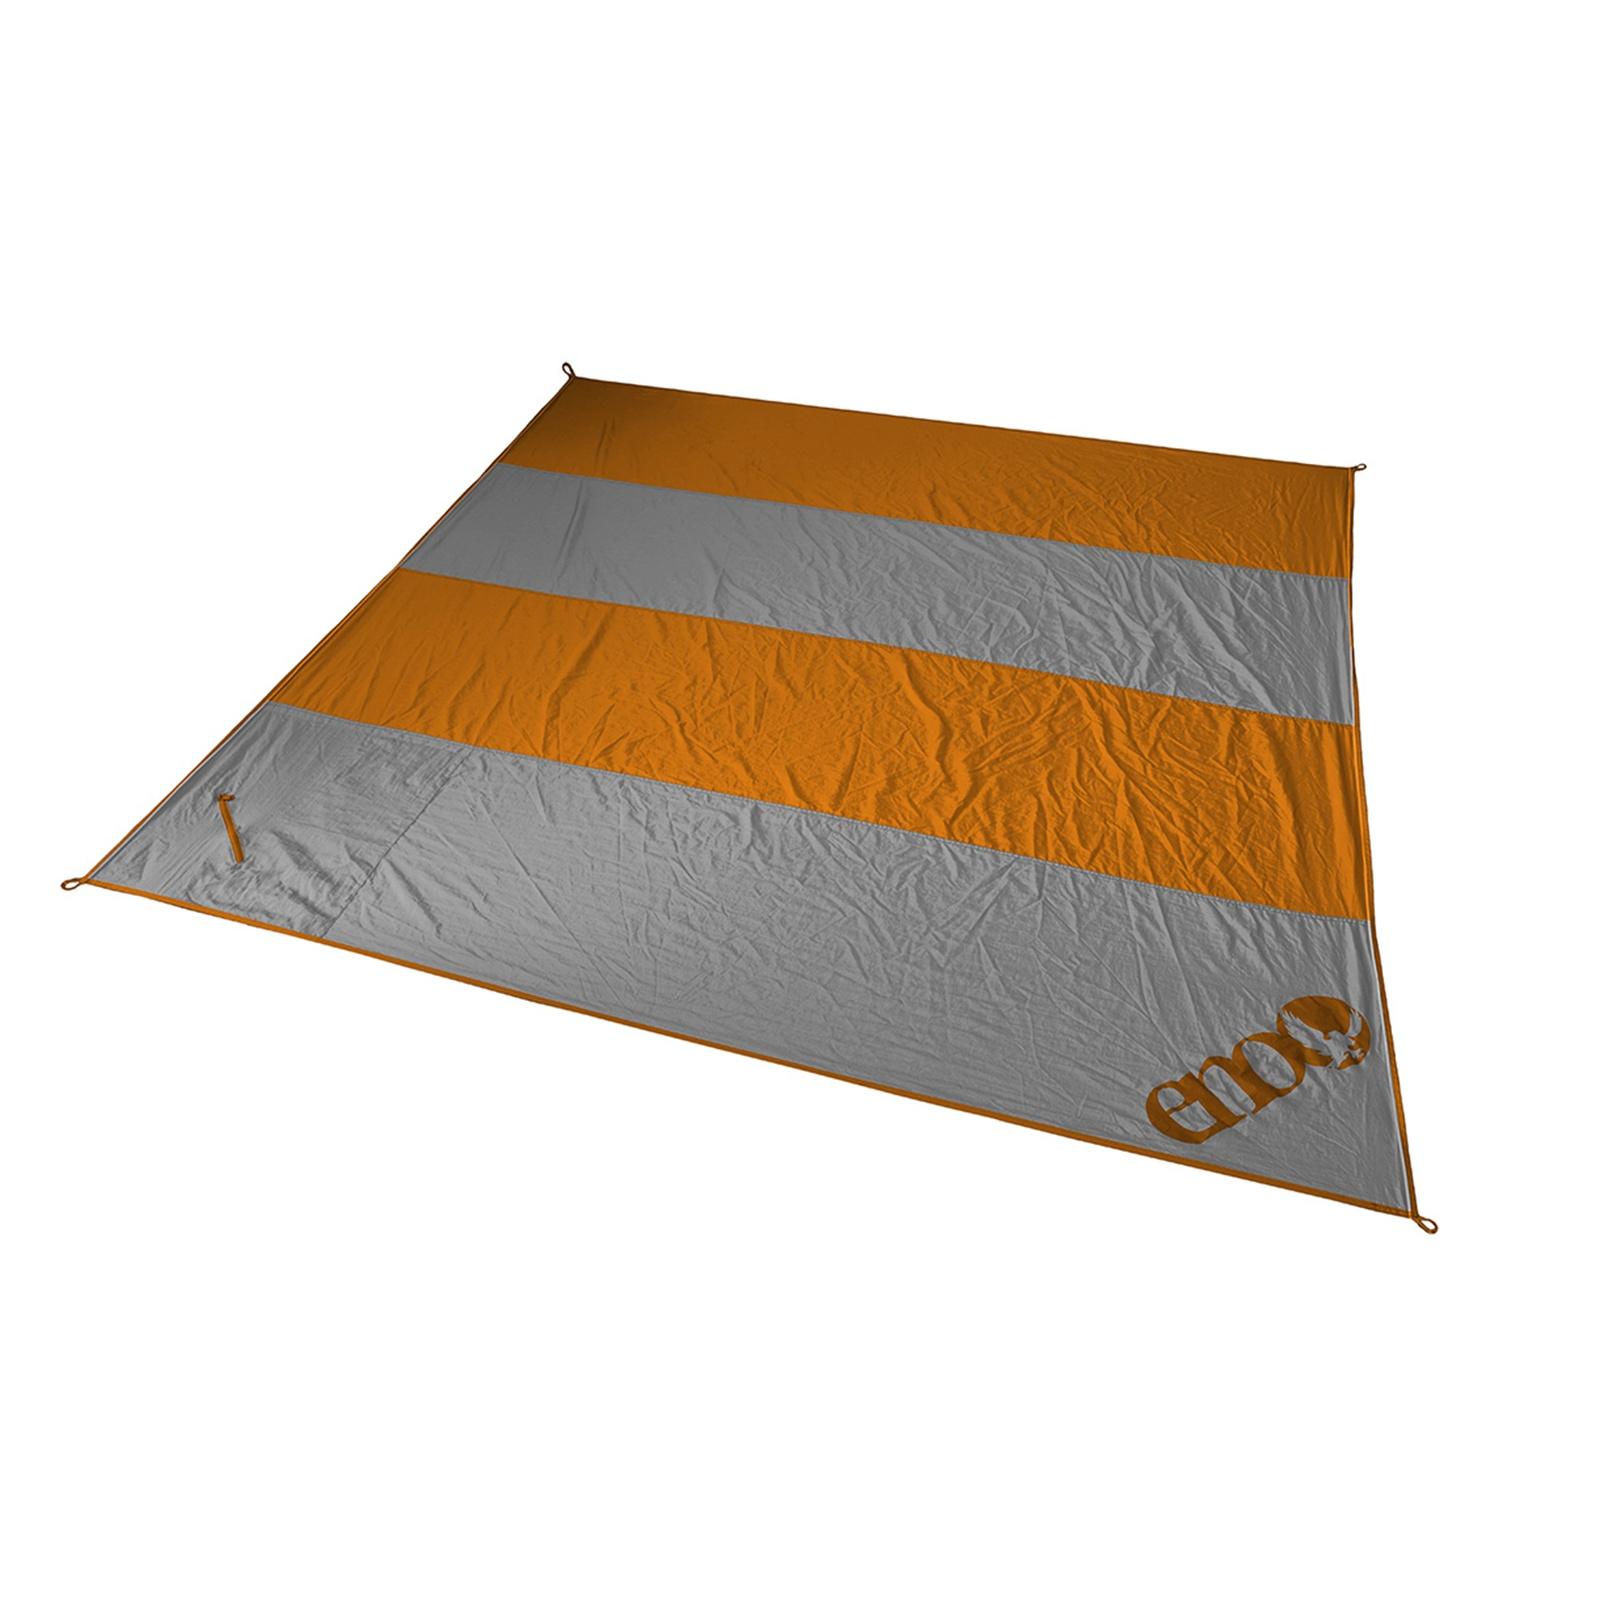 Islander Blanket Orange/Grey